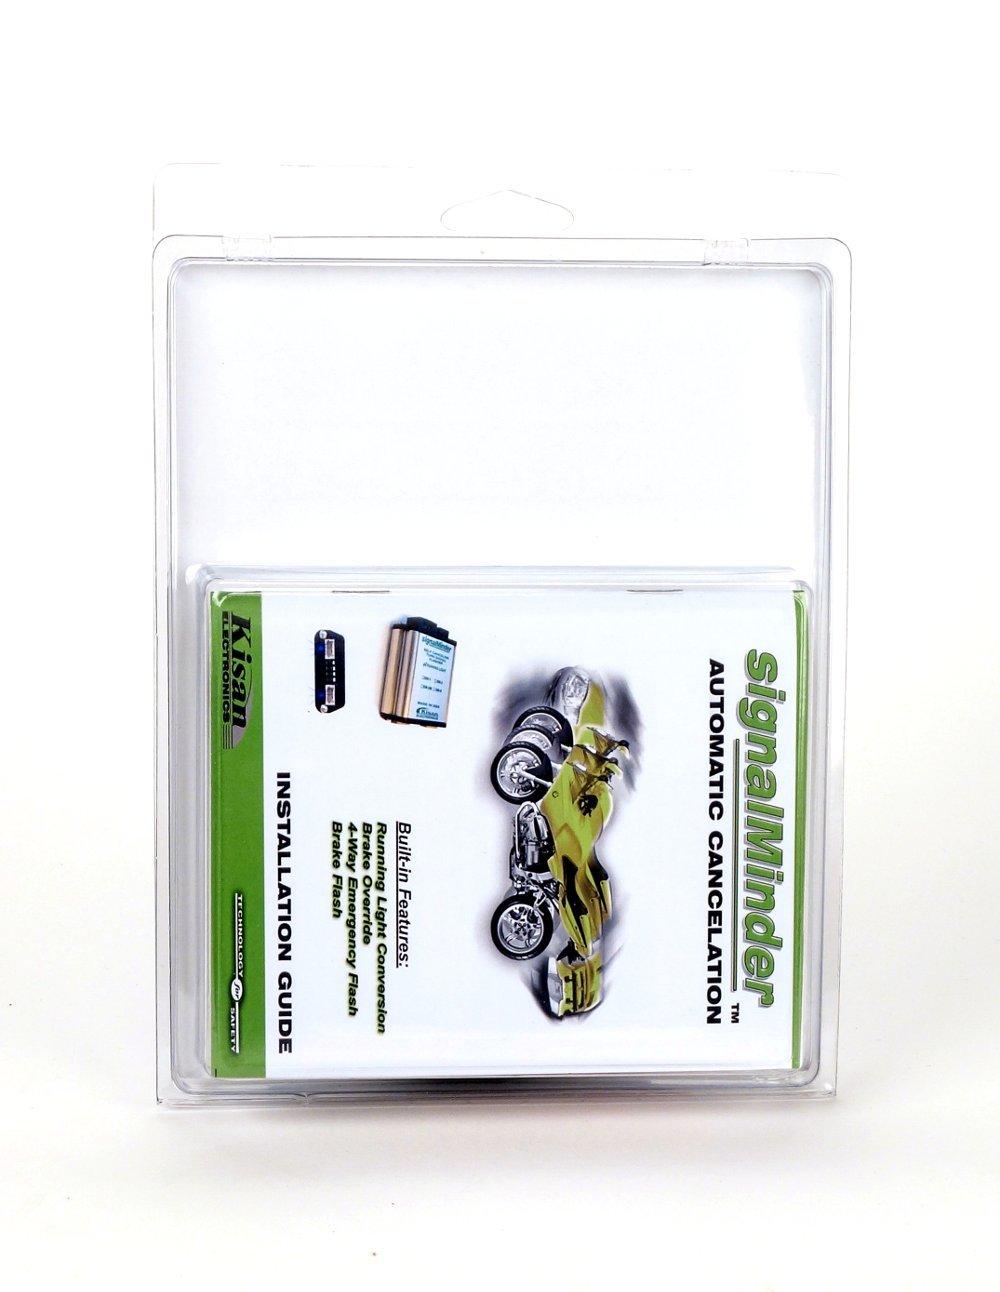 Motor-mh Adjustable CNC Short Brake Clutch Levers for Honda CBR300R//CB300F//FA 2014-2019,CBR500R//CB500F//X 2013-2019,CBR250R ABS 2011-2013,CBR400R All Year MSX 125 Grom 2014-2019,Monkey//Z125 2019